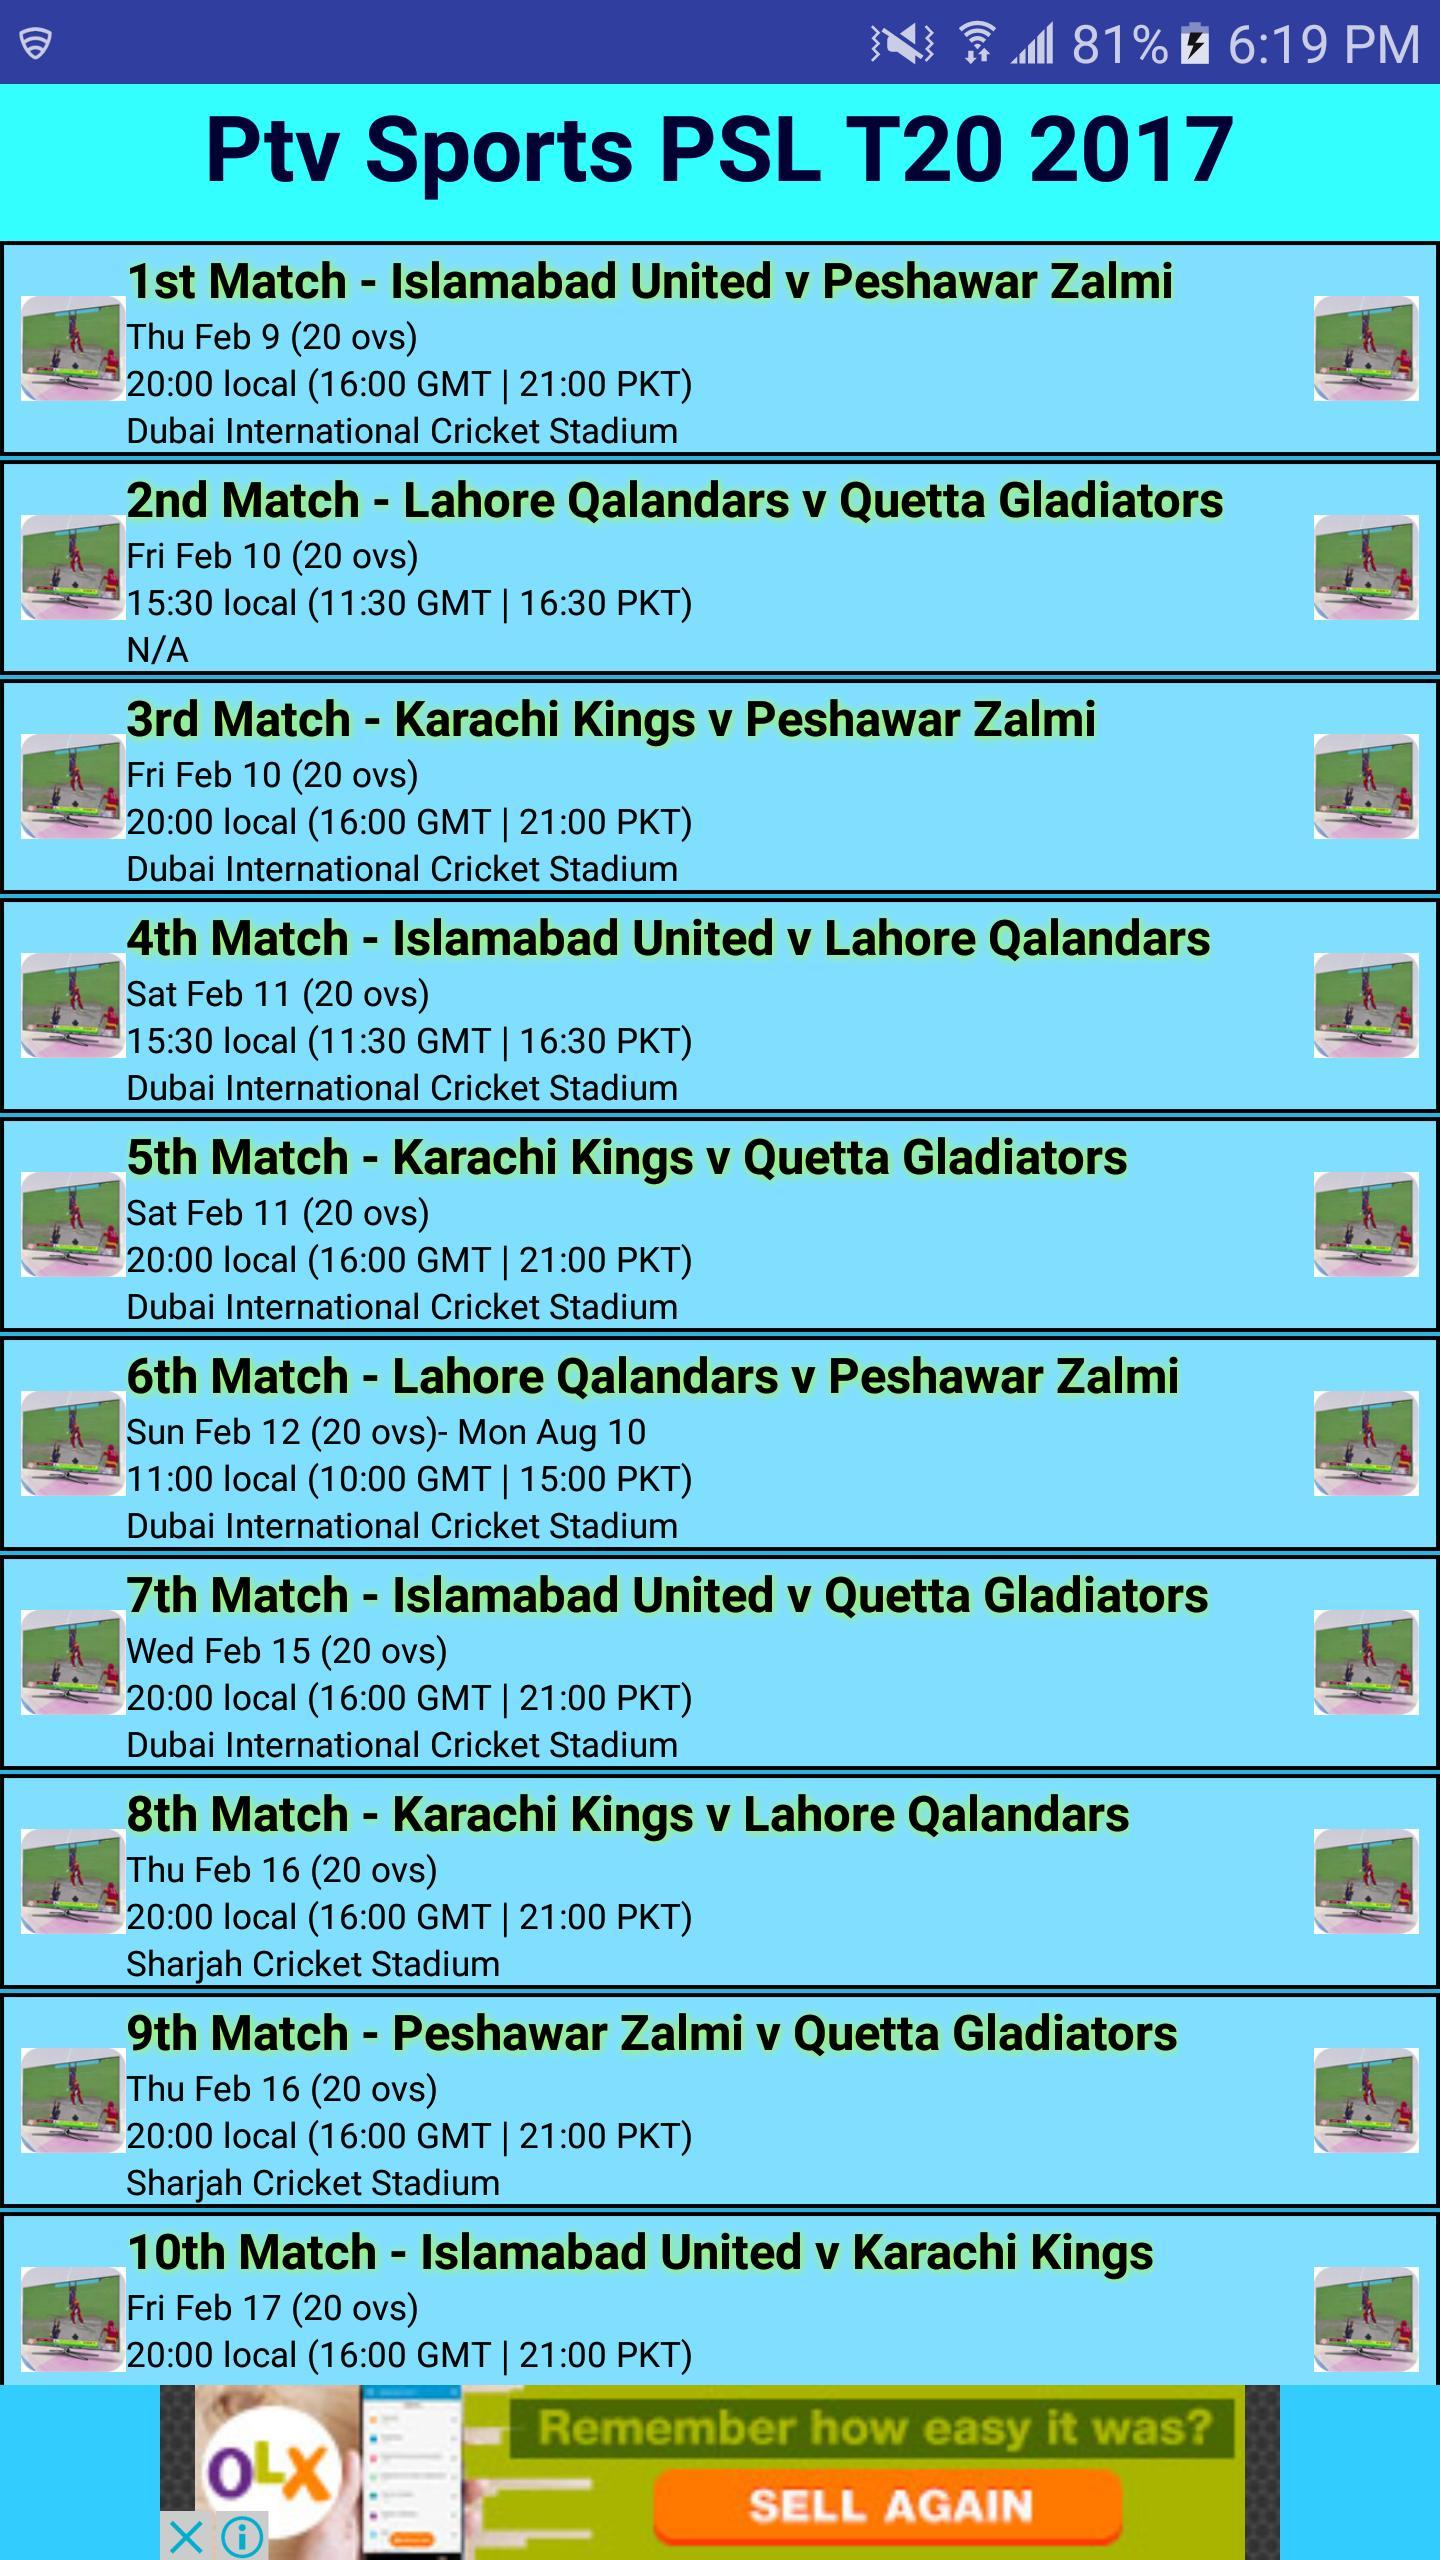 PTV Sports PSL Live Streaming 2018 Live Cricket TV pour